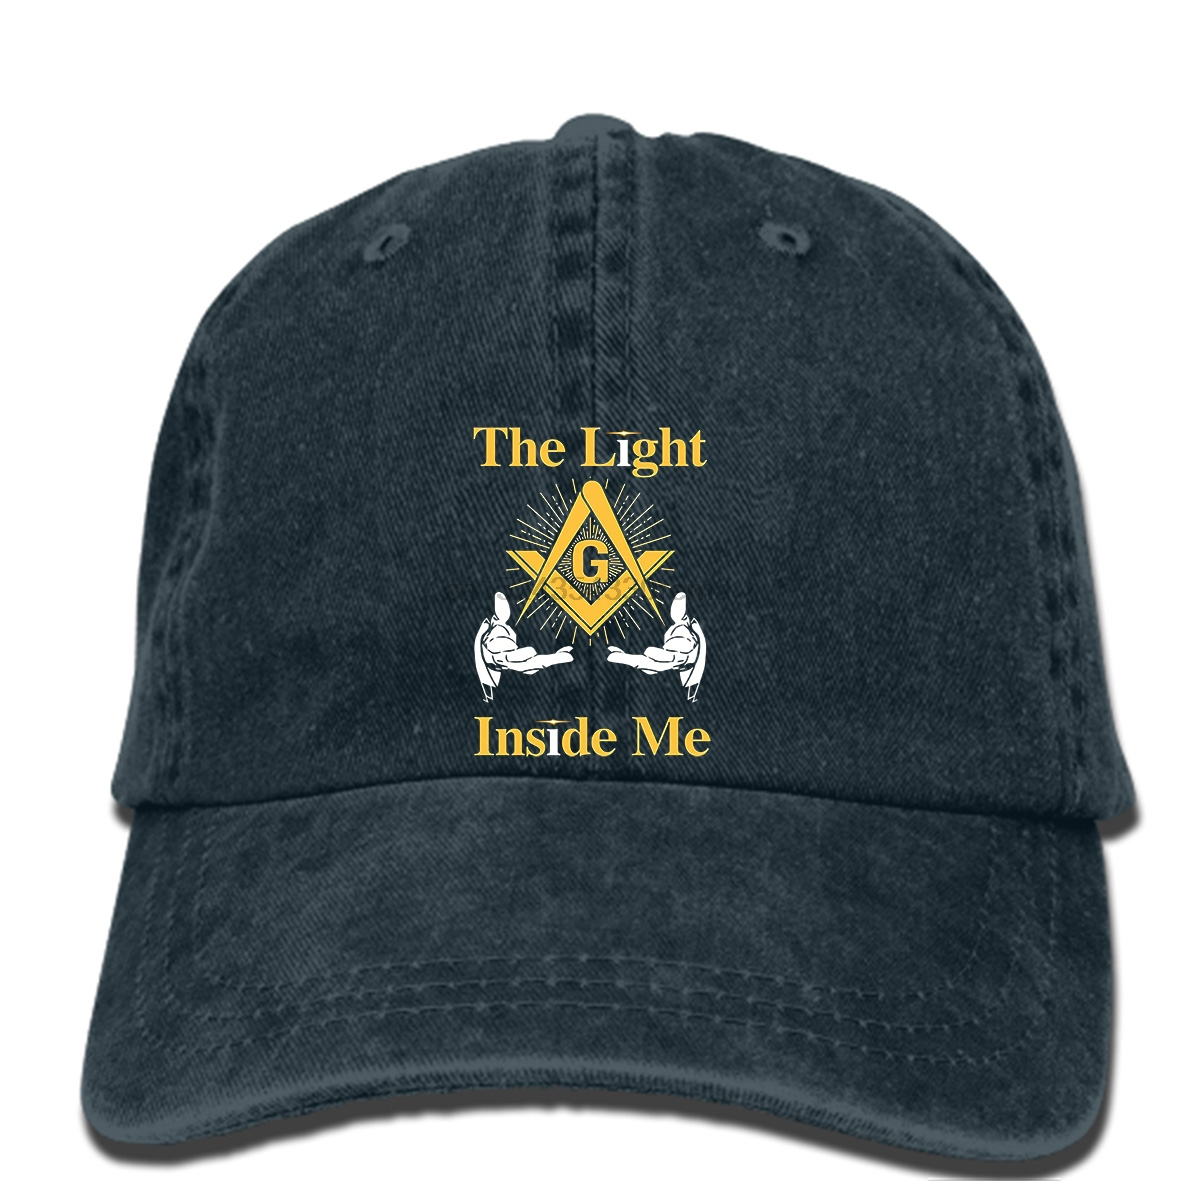 aeb461325cced hip hop Baseball caps The Masonic Store Freemason the Light Inside Me Men s  hat New Fashion